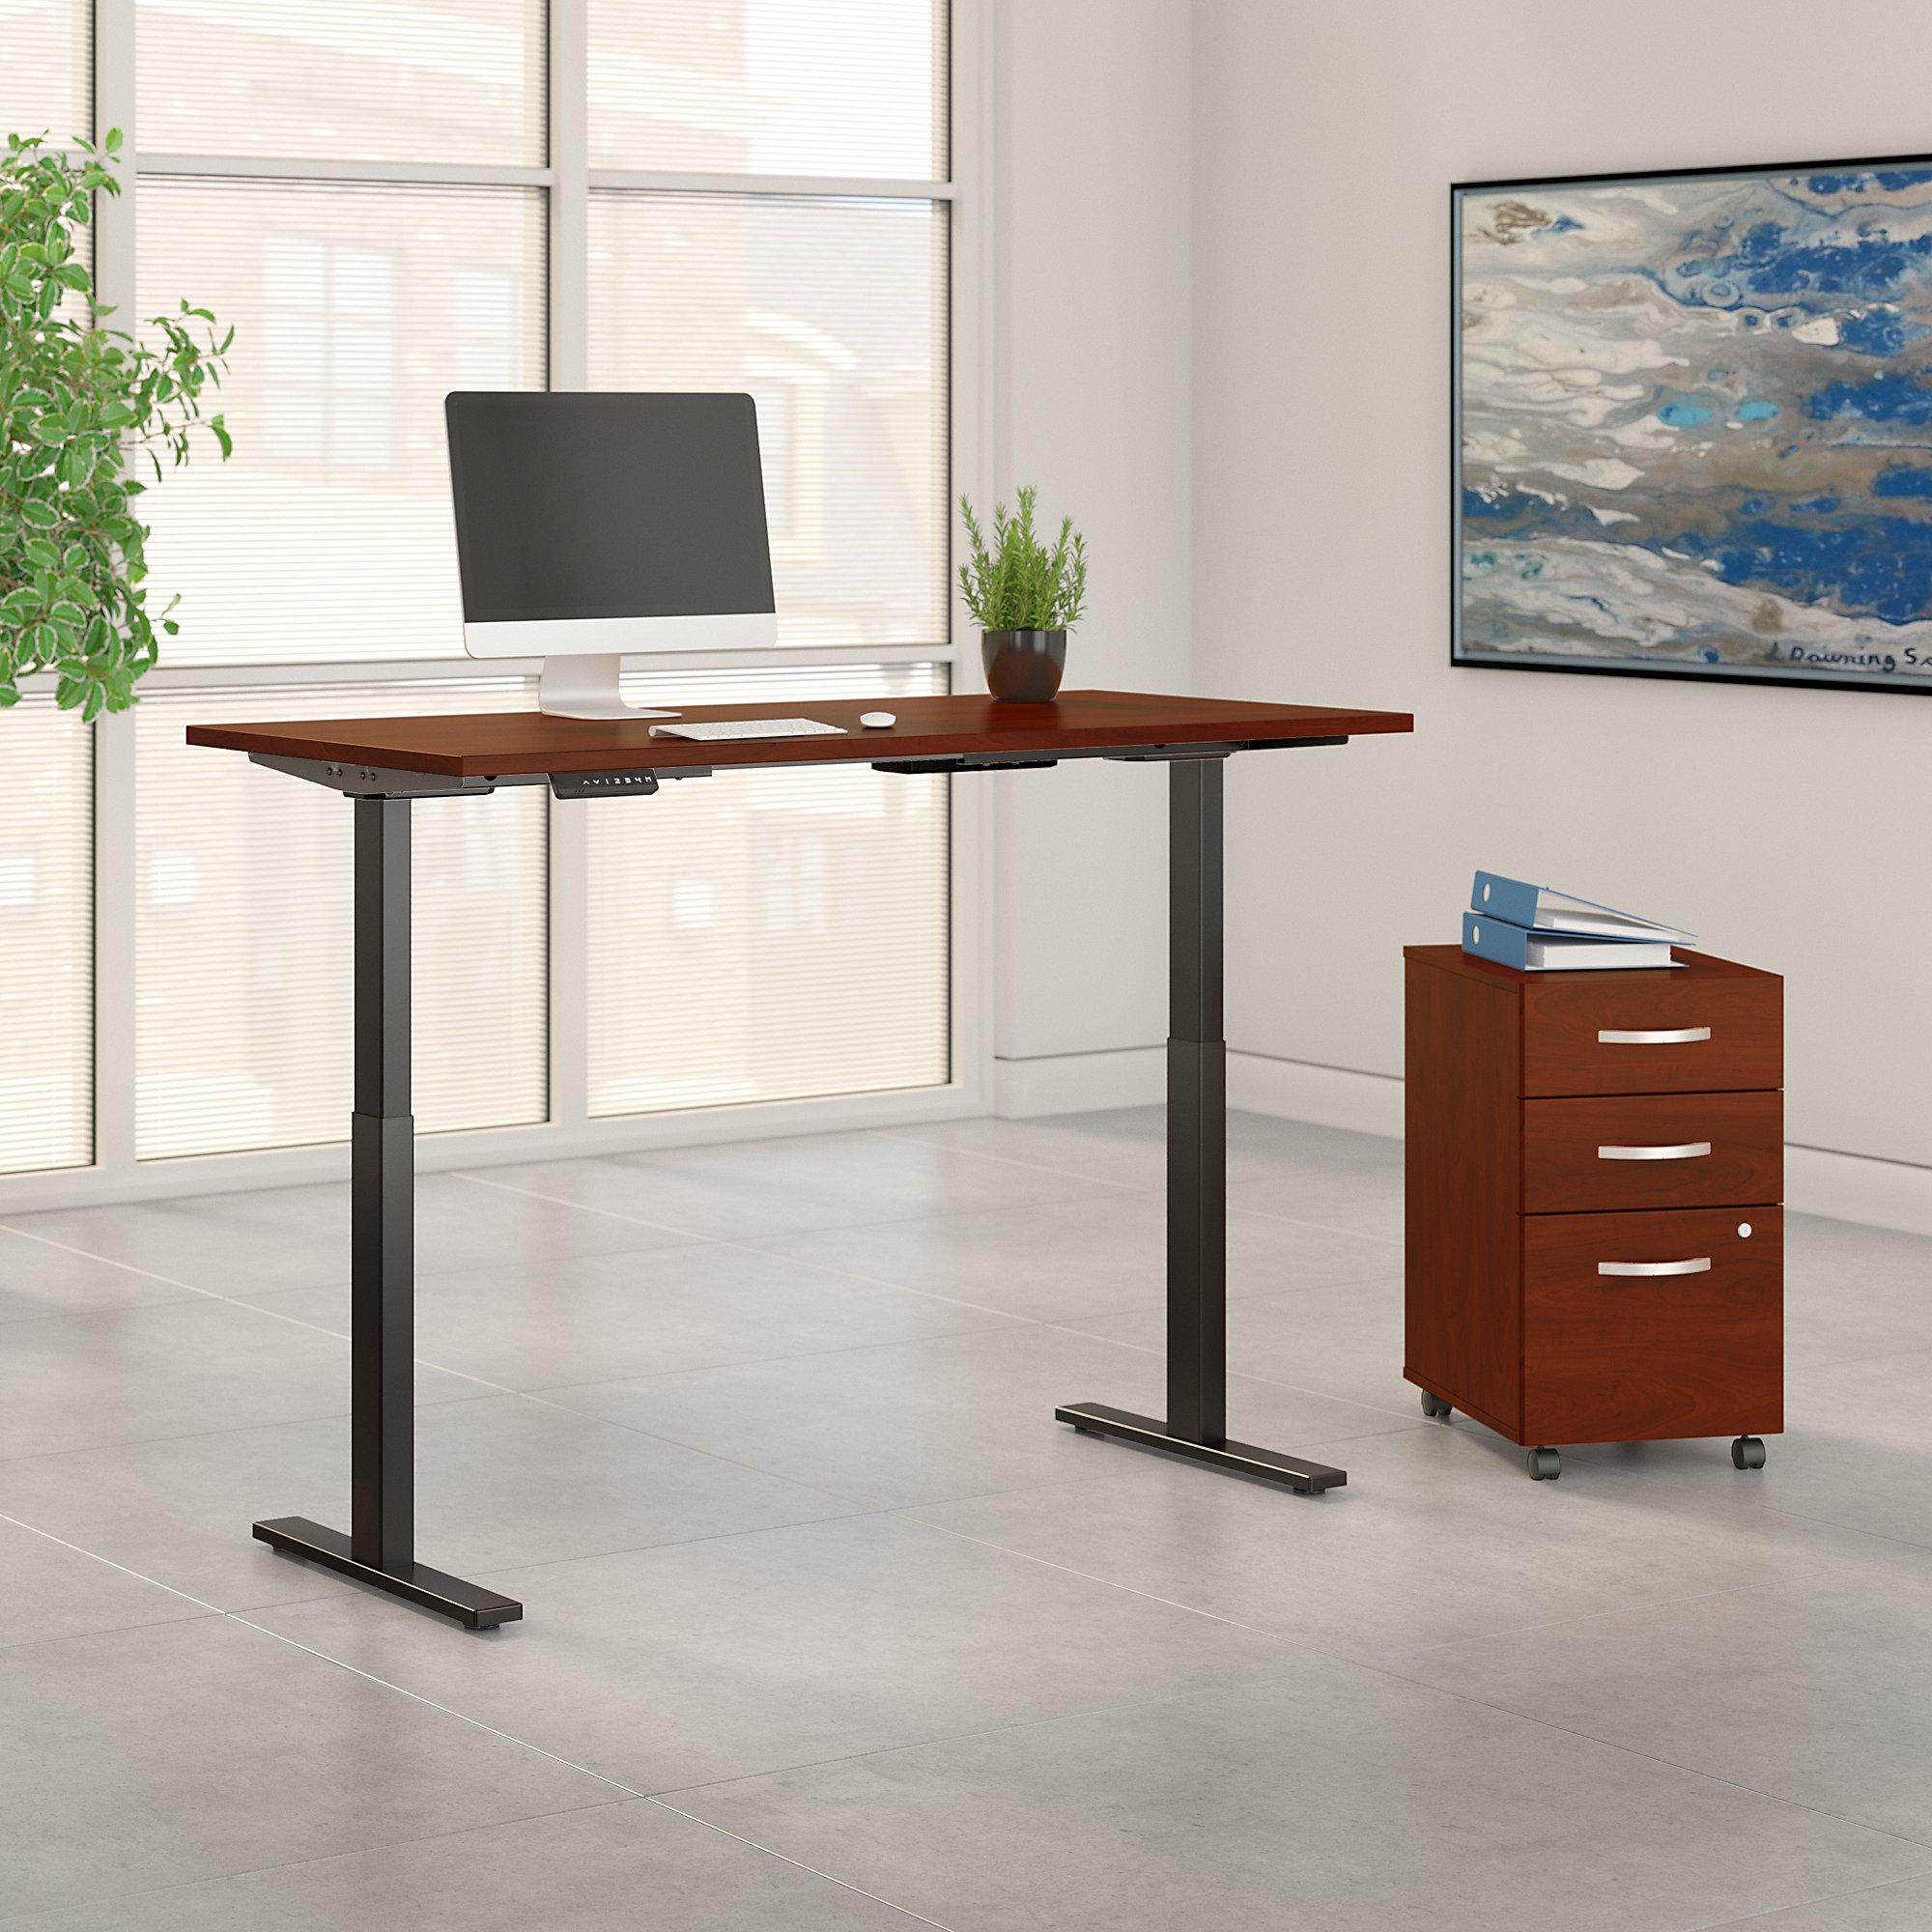 hansen cherry 60x30 adjustable desk with file cabinet